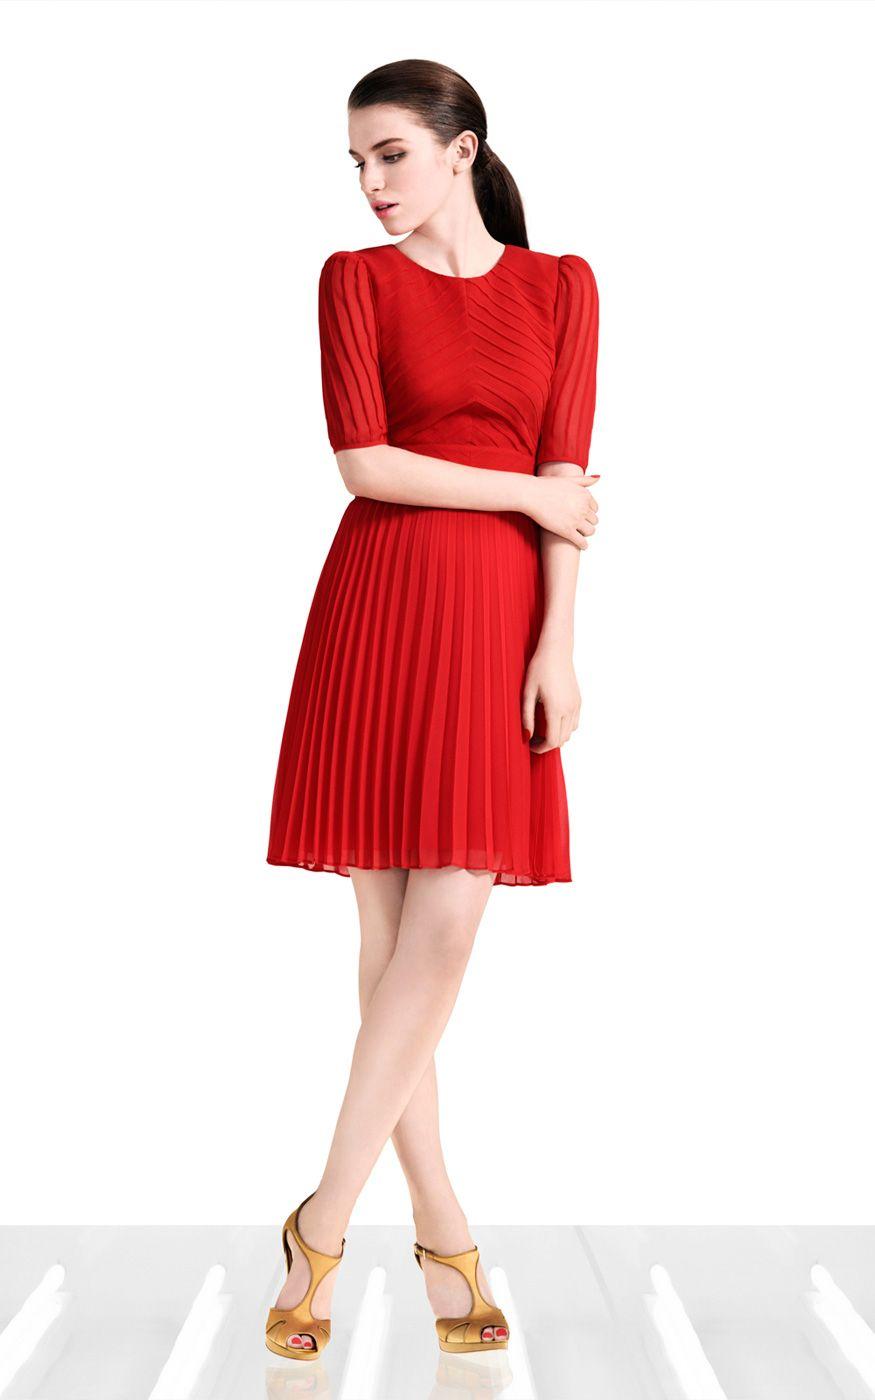 2017 Women Work Dress Fashion Dress Street Style Red Black Ruffle Knee Length Round Neck Half